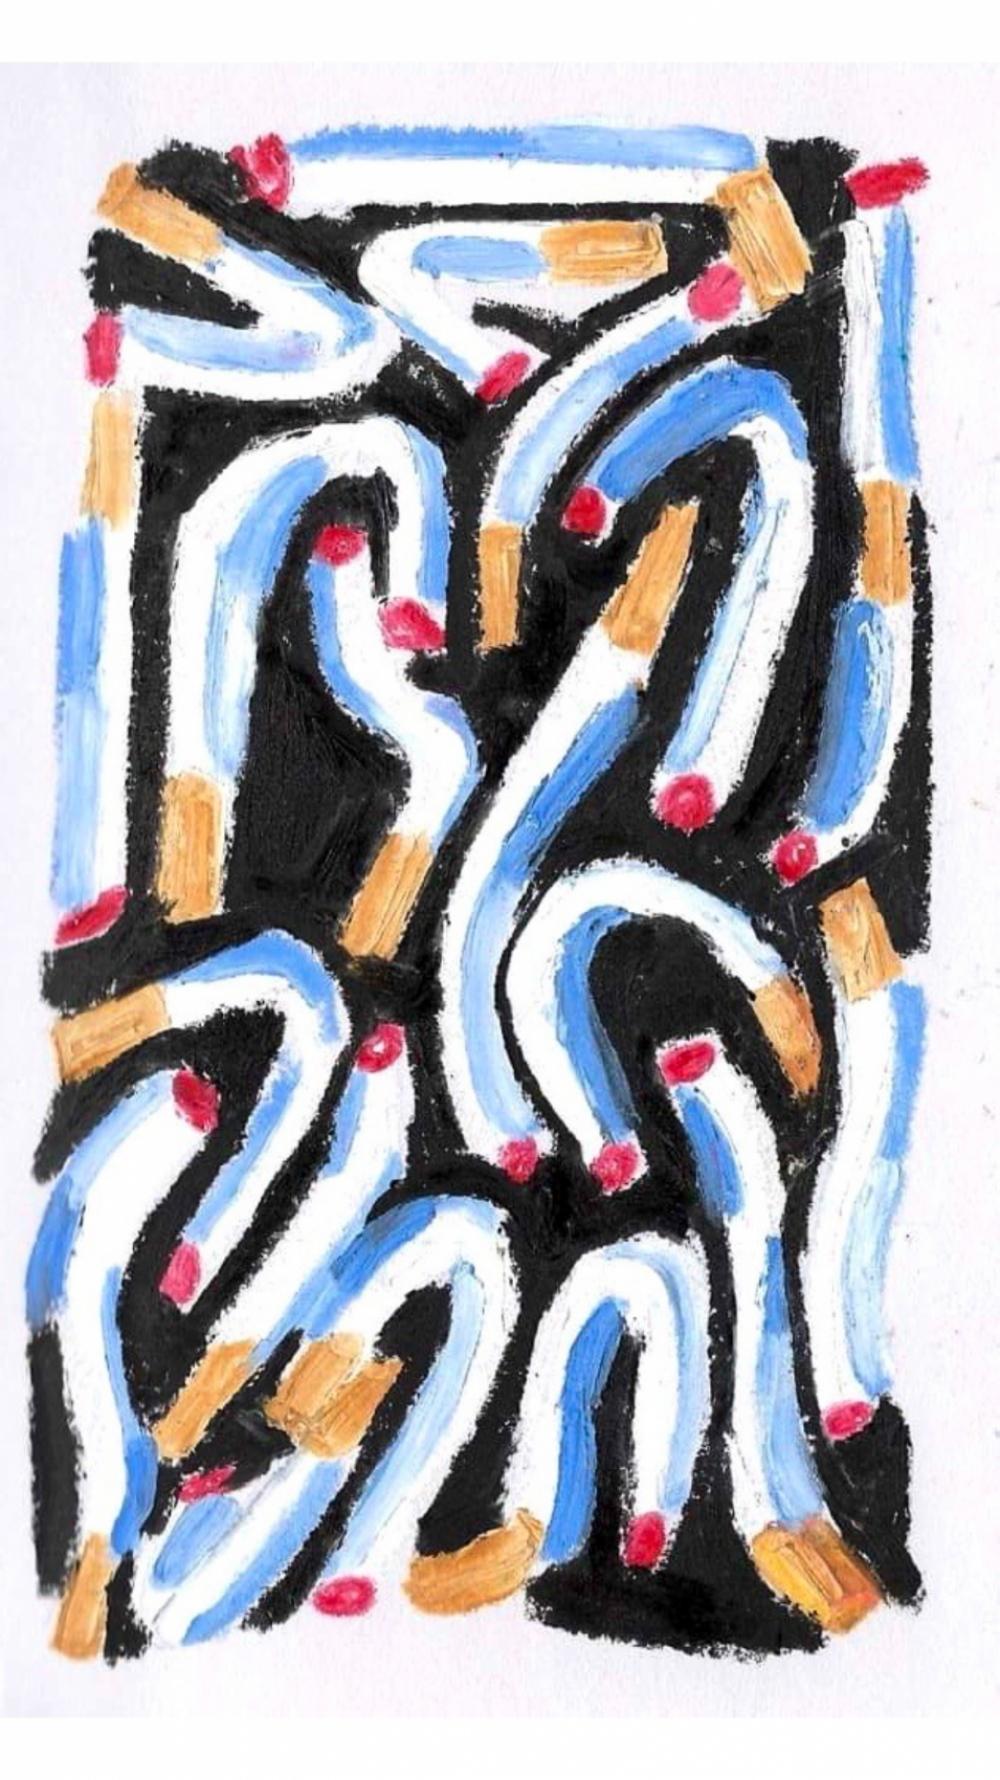 Anna Choutova - Cigarette Snakes 5 Oil Pastel on Paper21 cm x 15 cm